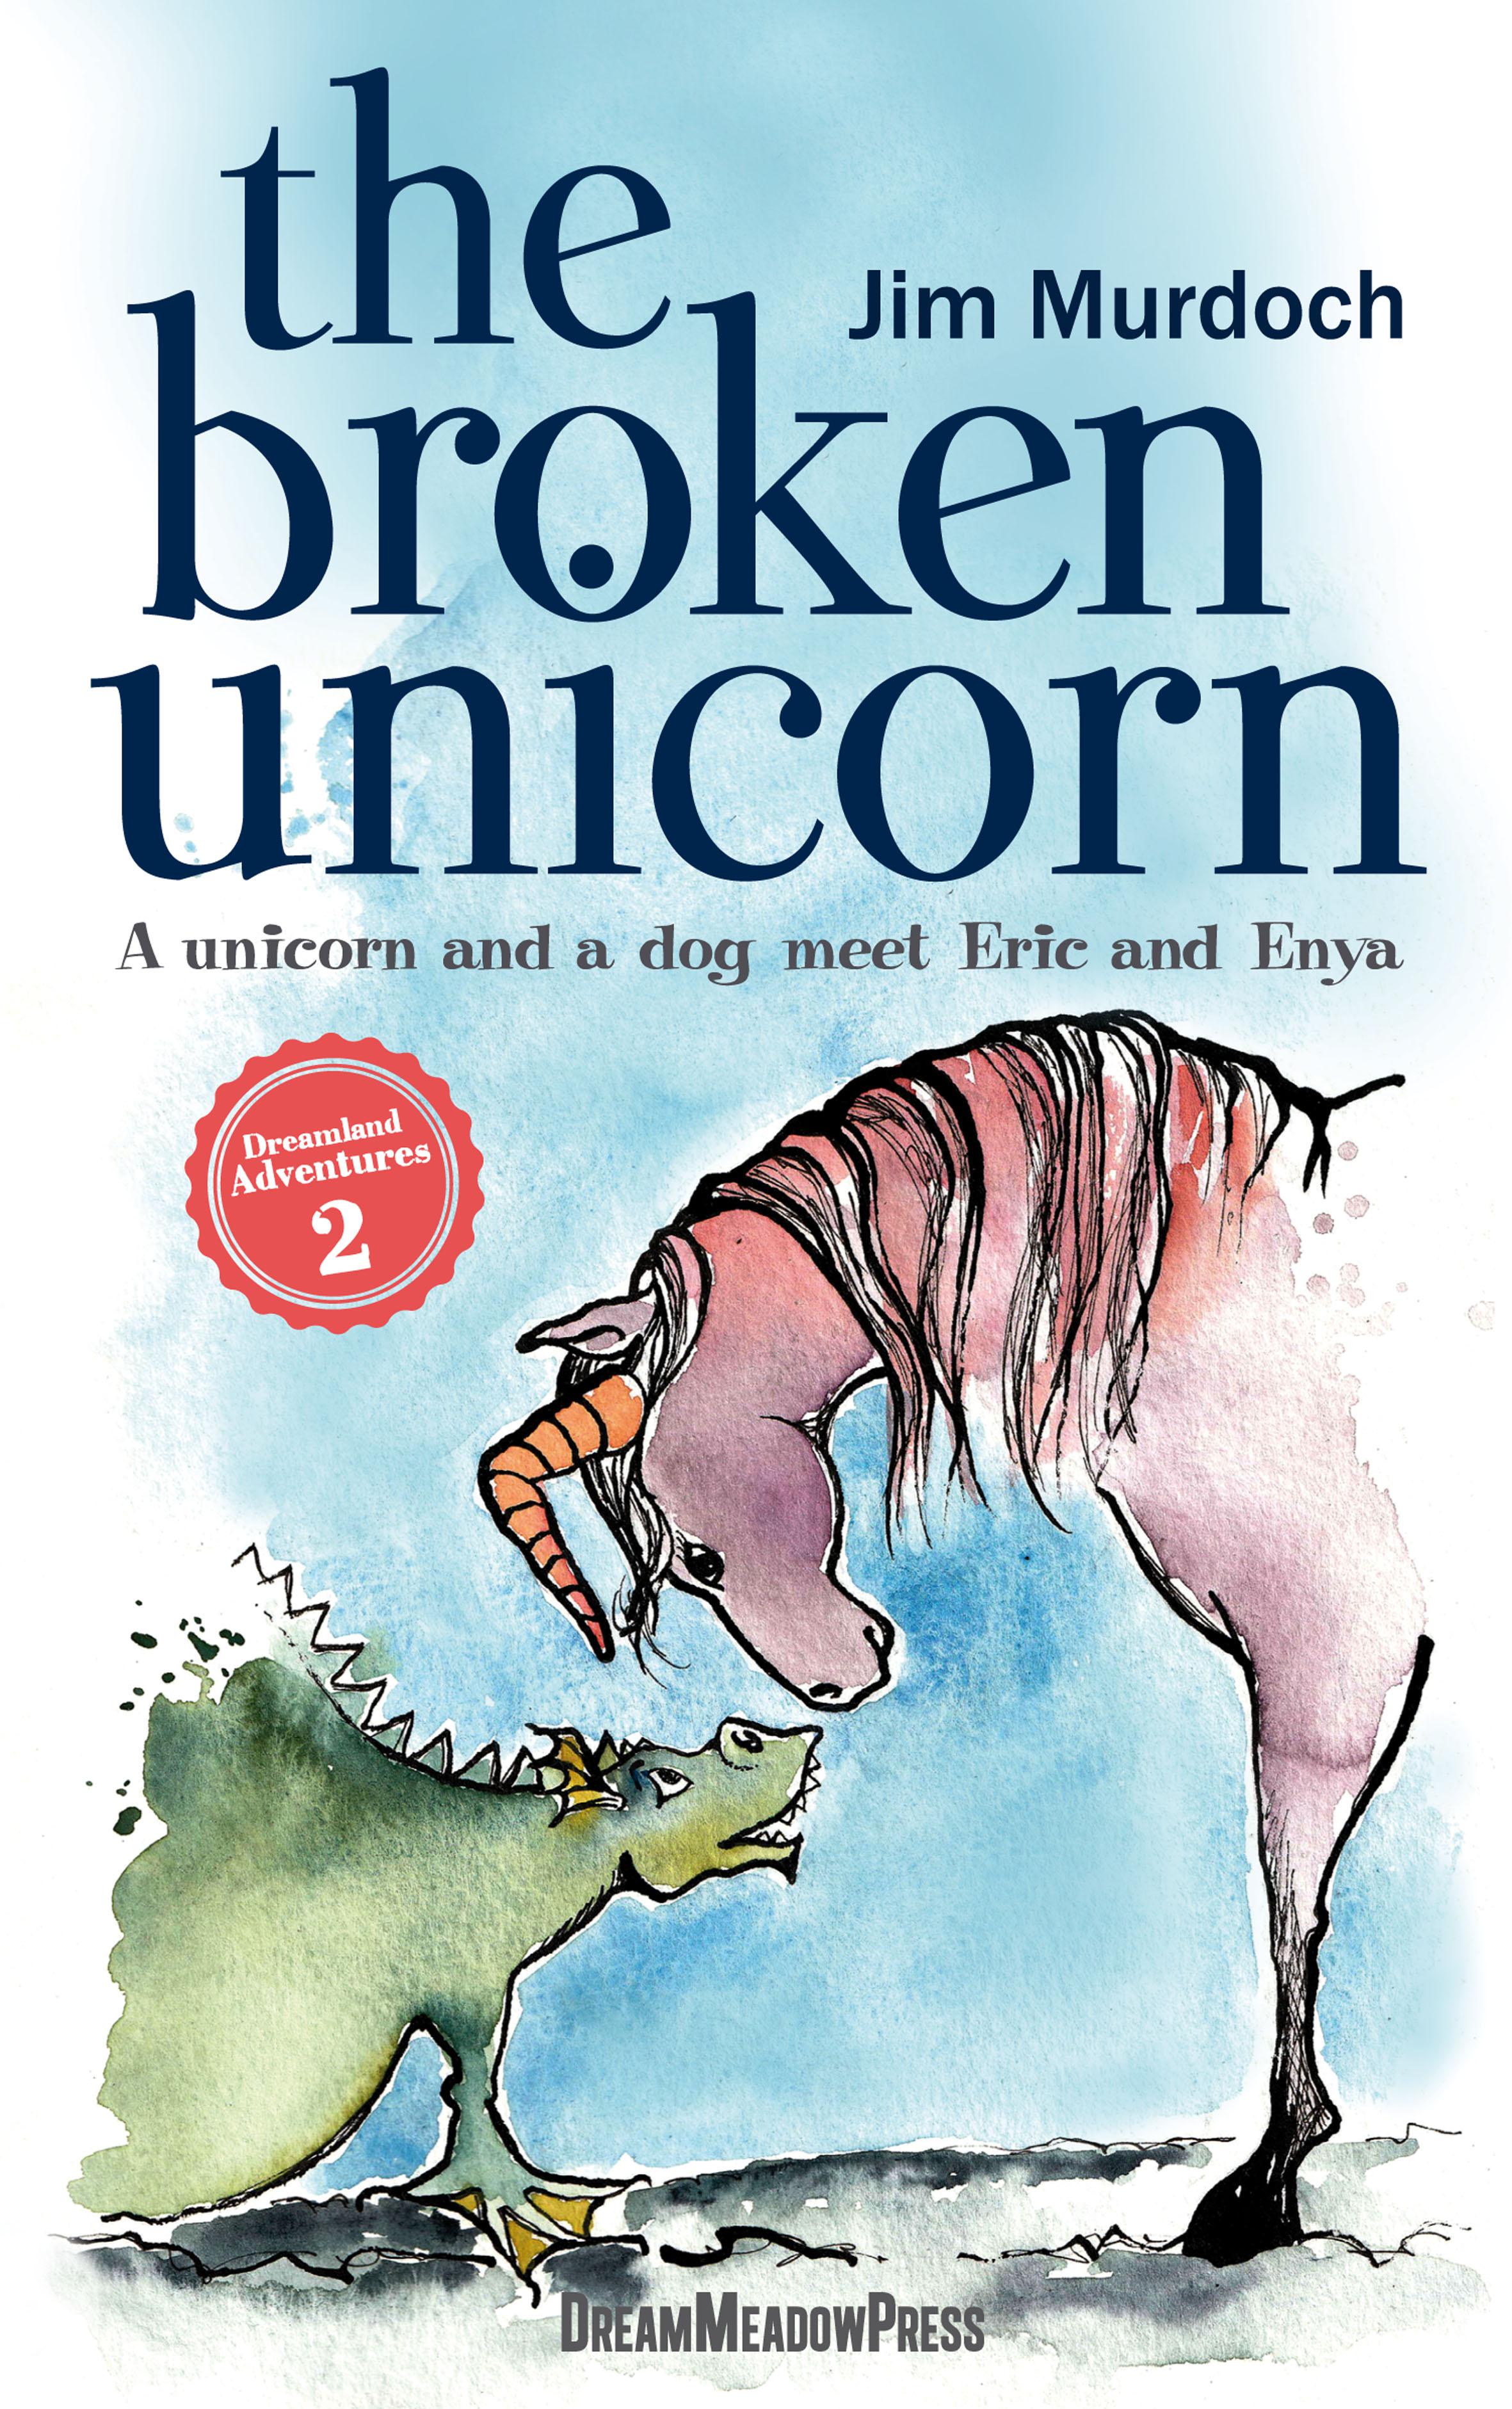 The Broken Unicorn (Dreamland Adventures #2)